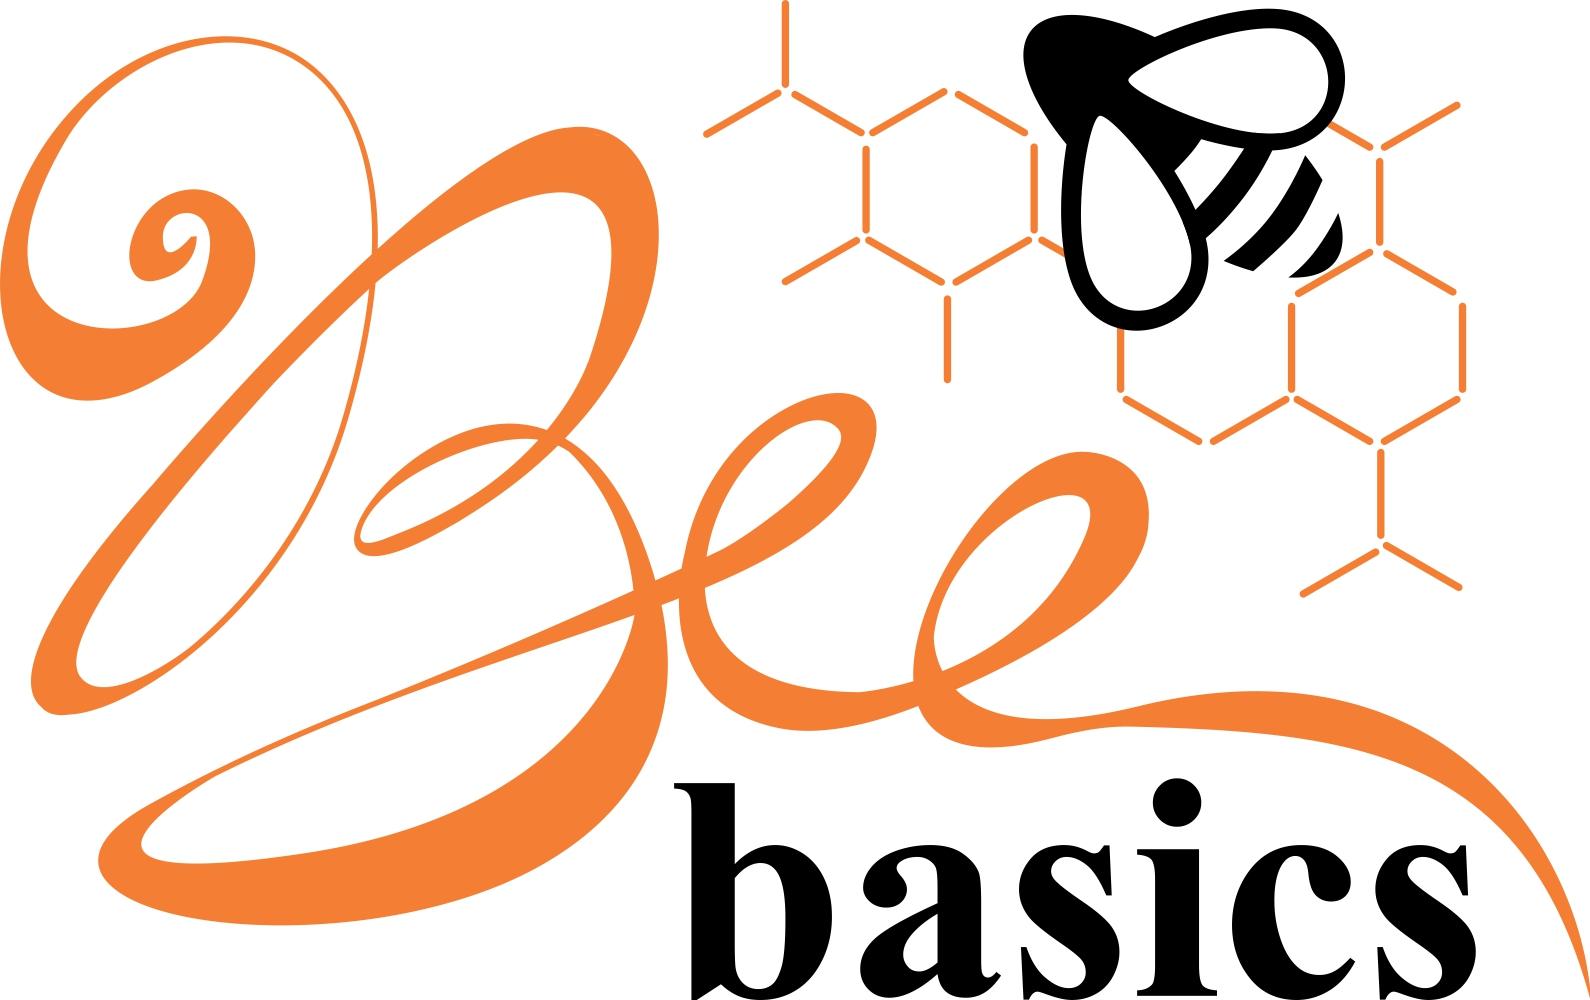 Bee Basics Cosméticos Naturais